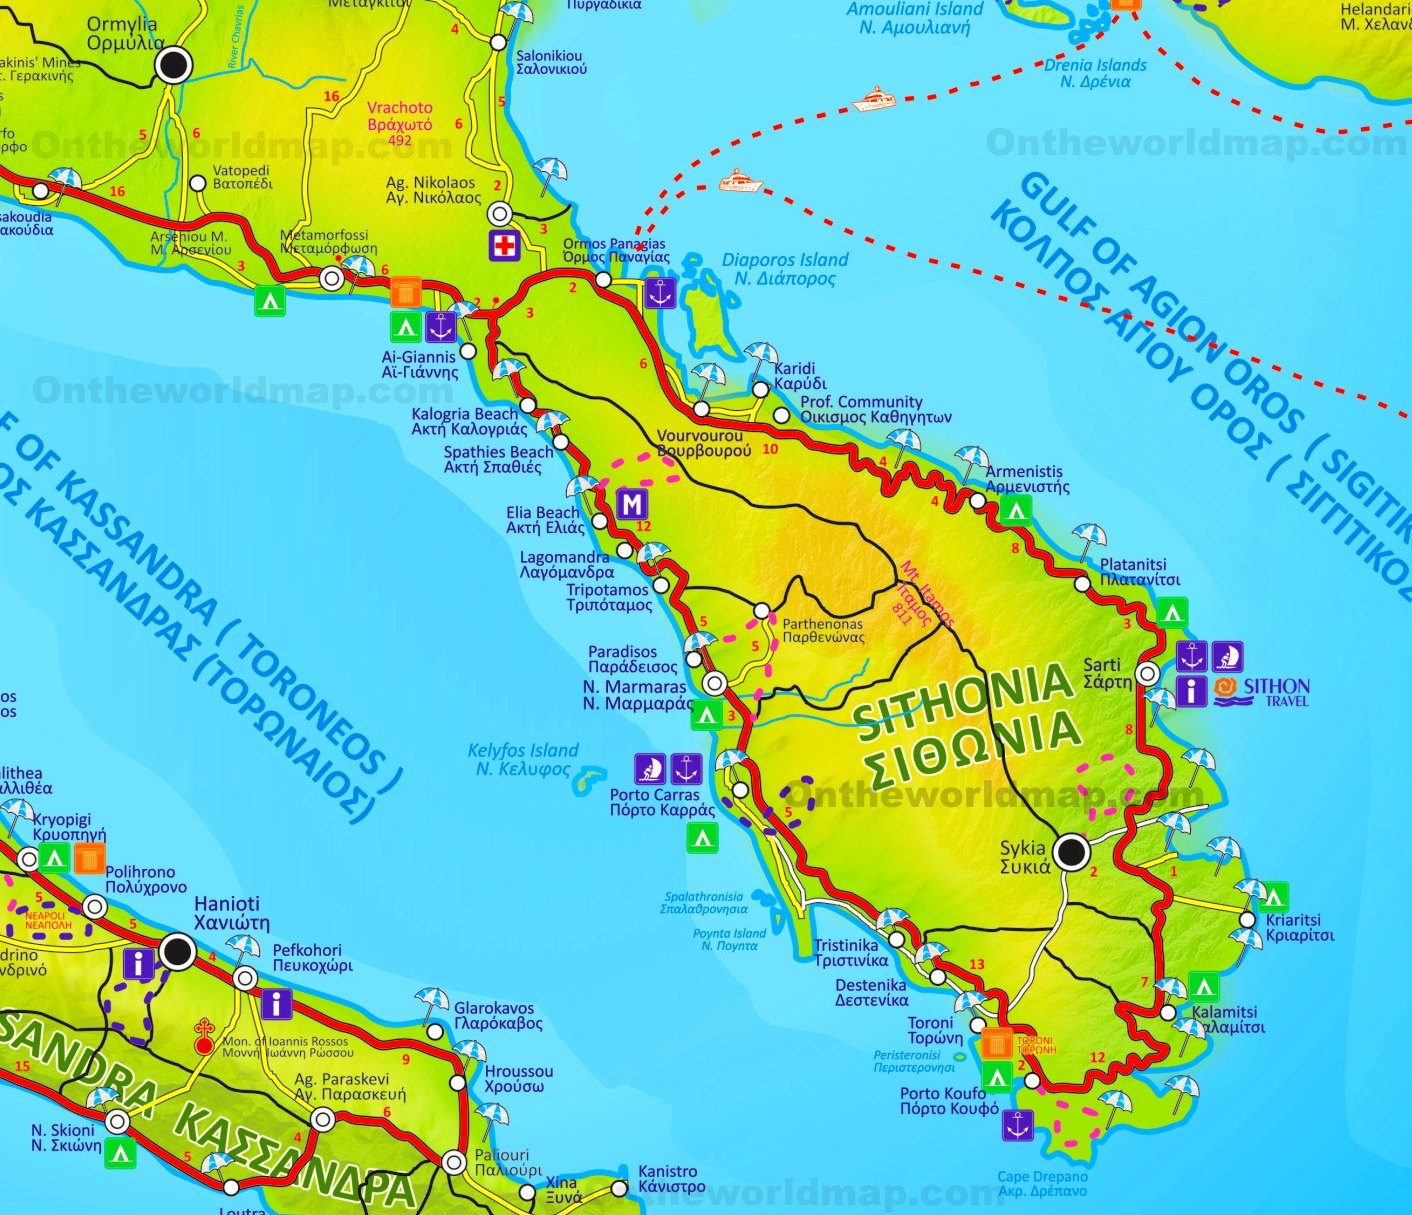 Sithonia Maps | Greece | Maps of Sithonia